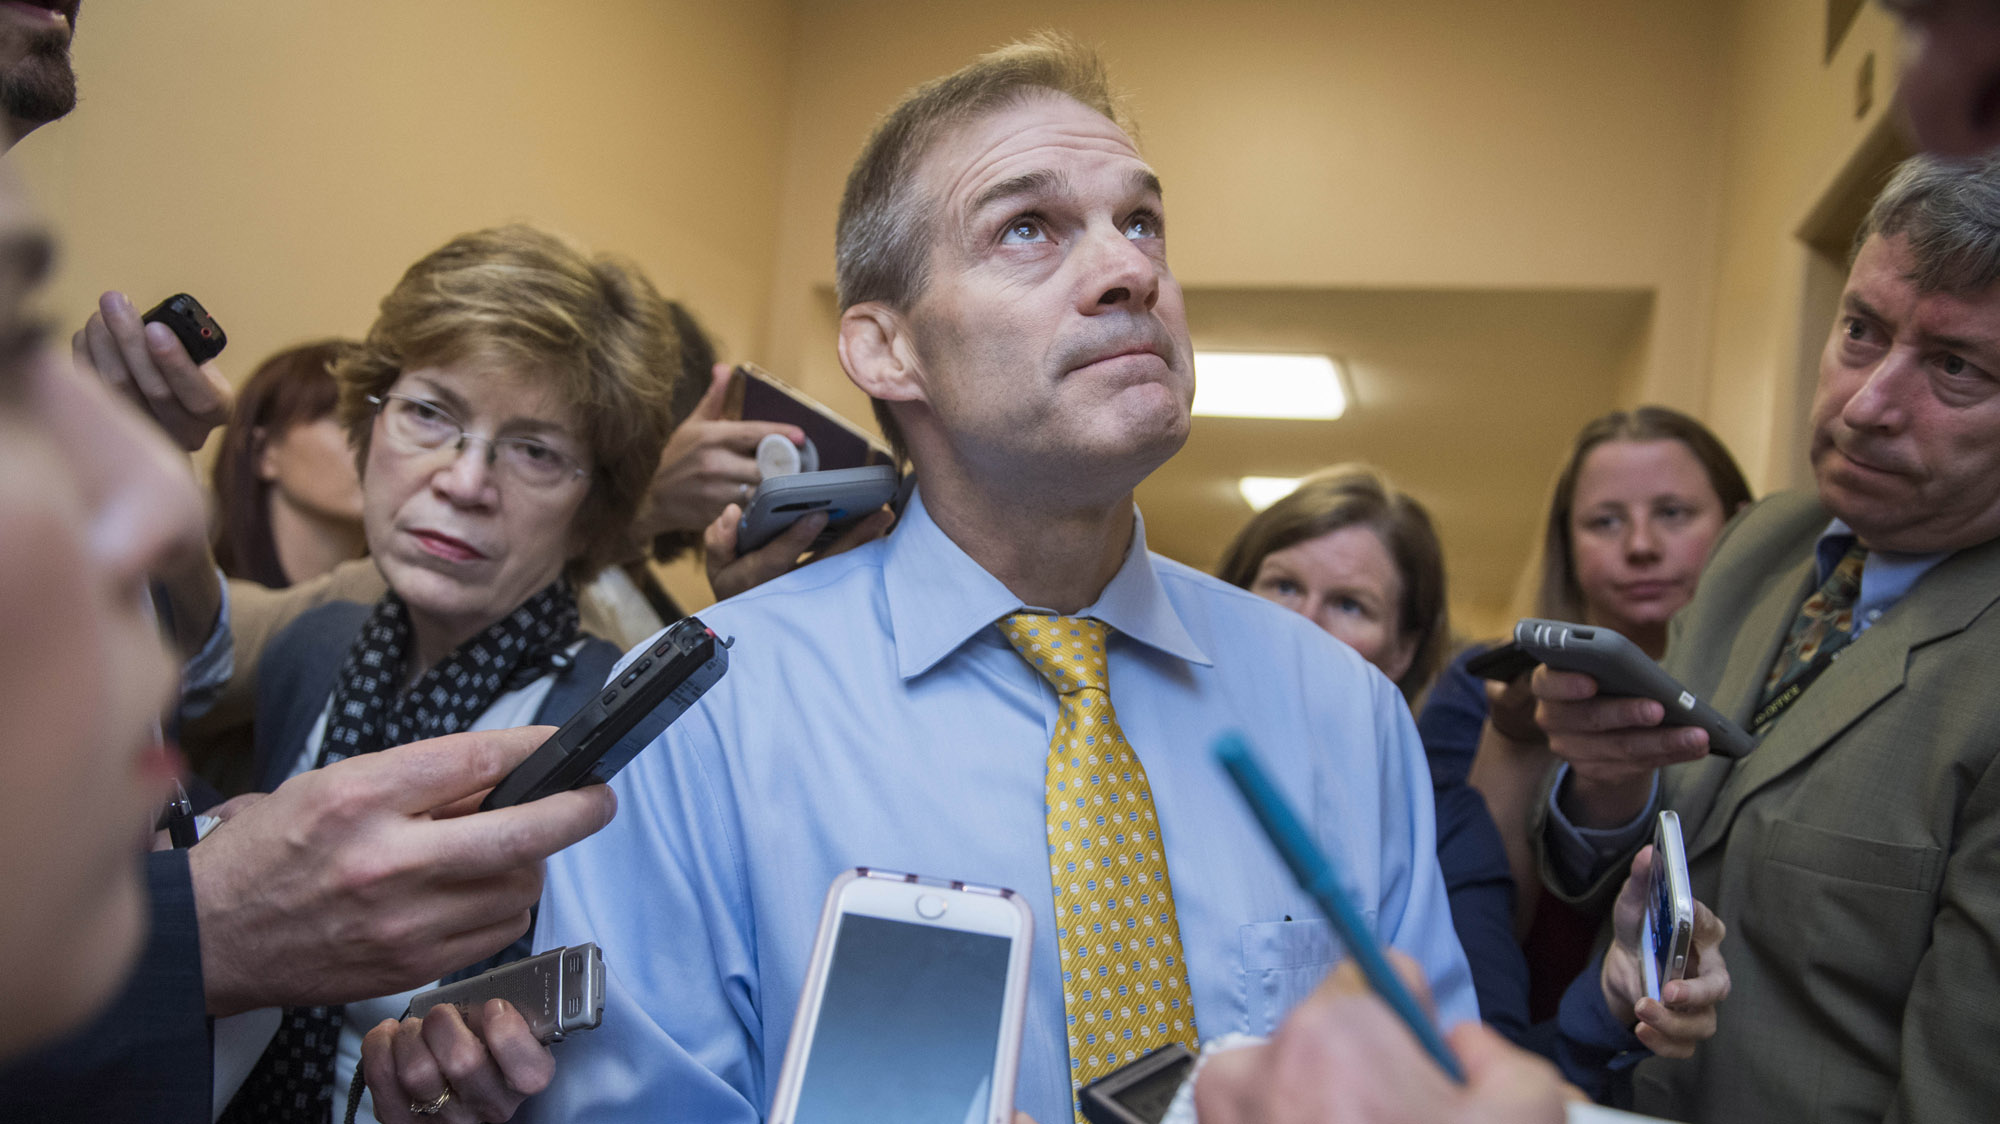 GOP Rep. Jim Jordan Accused of Ignoring Sex Abuse at Ohio